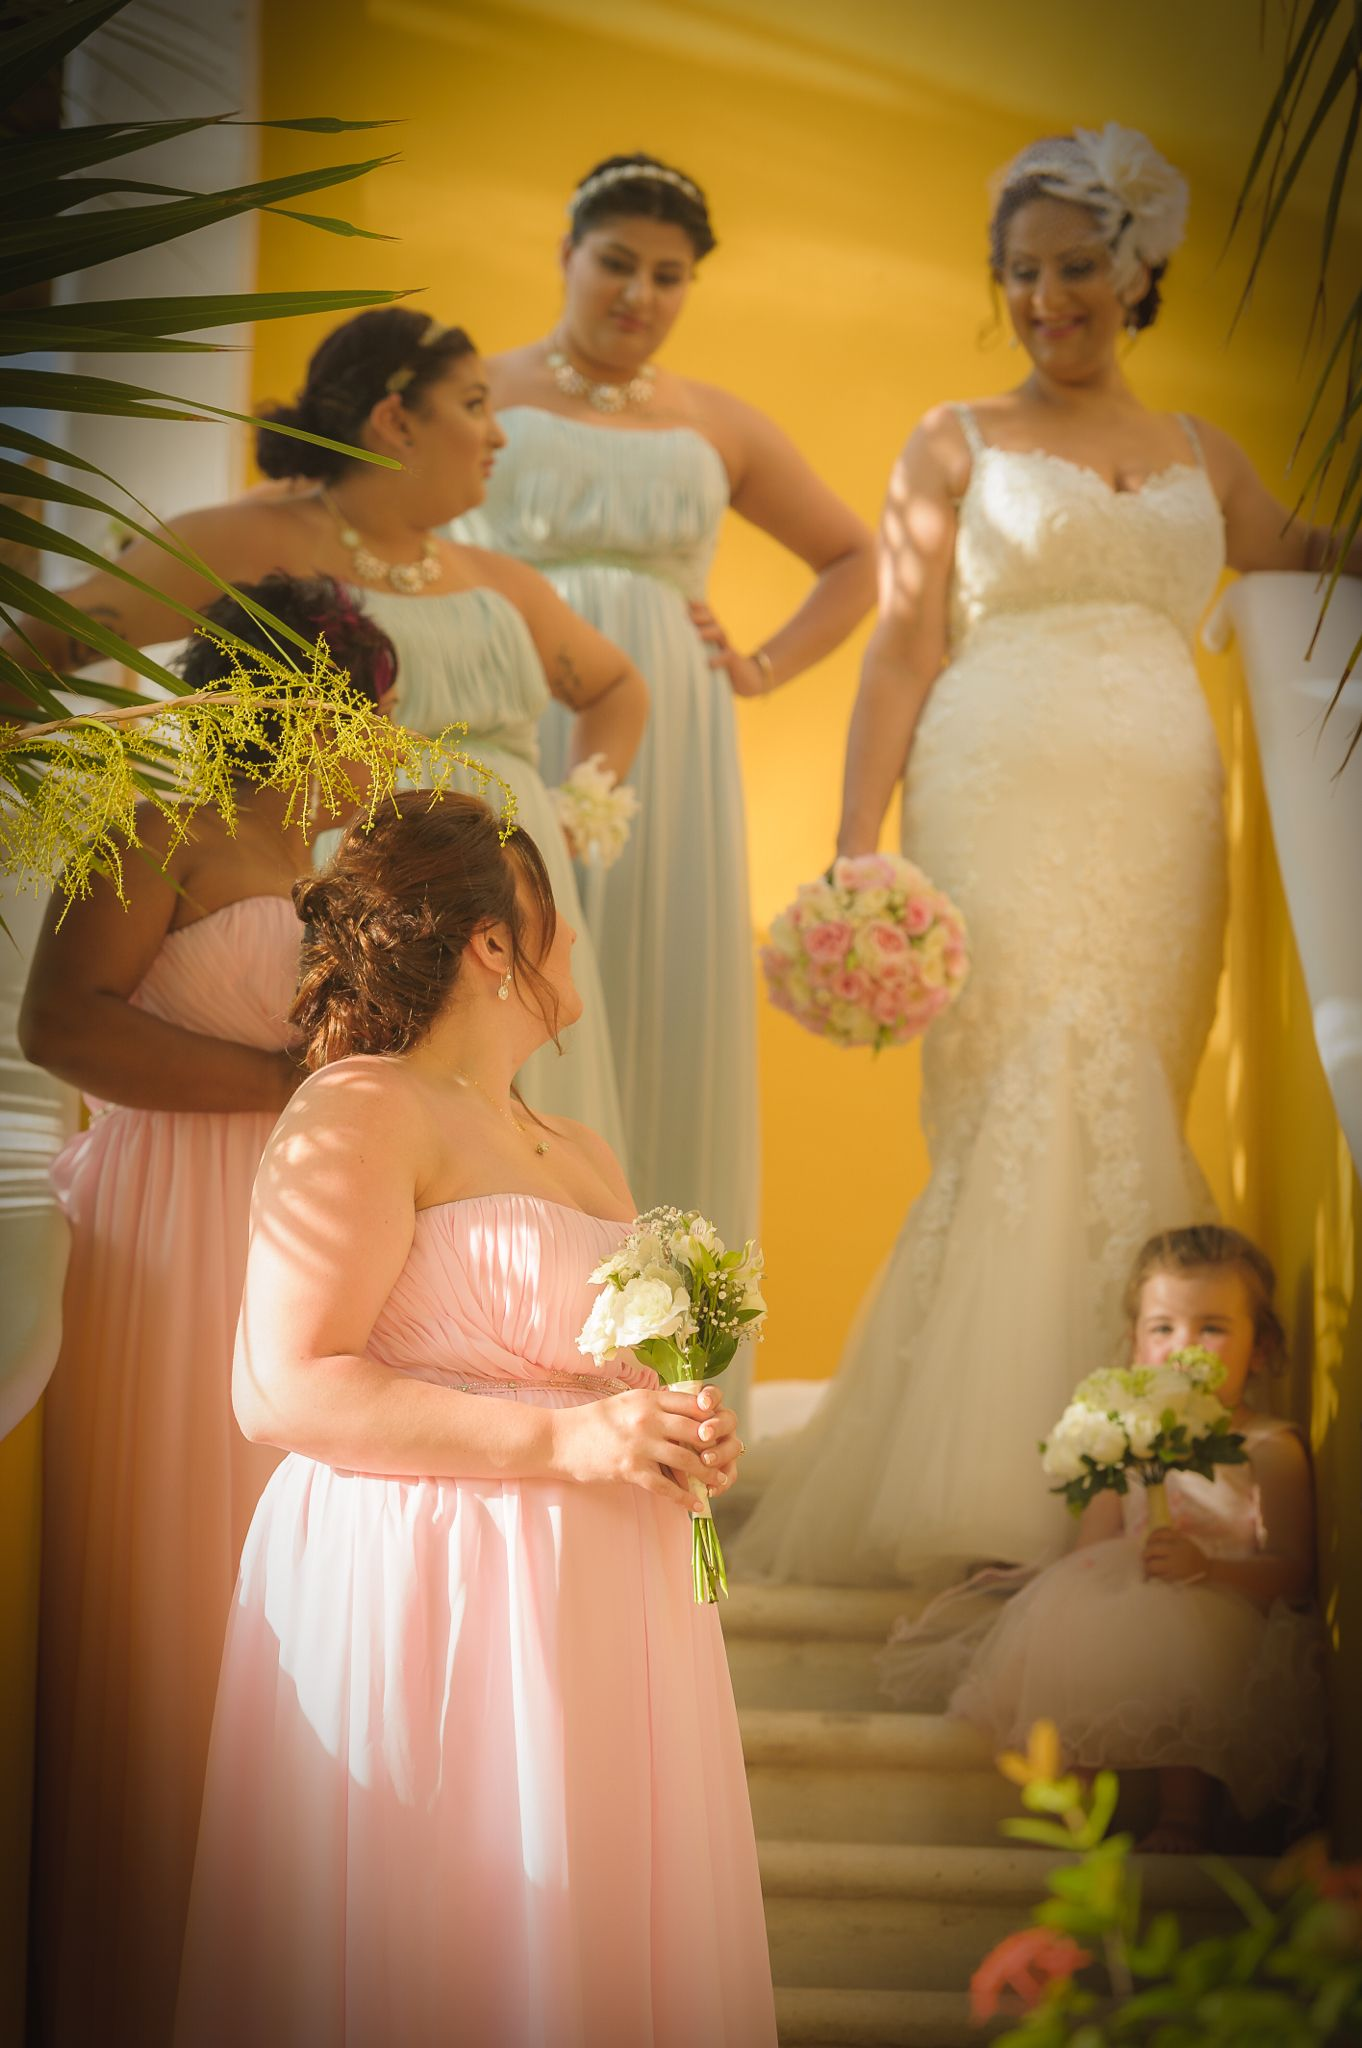 #weddingphoto #beachwedding #bridesmaiddresspink